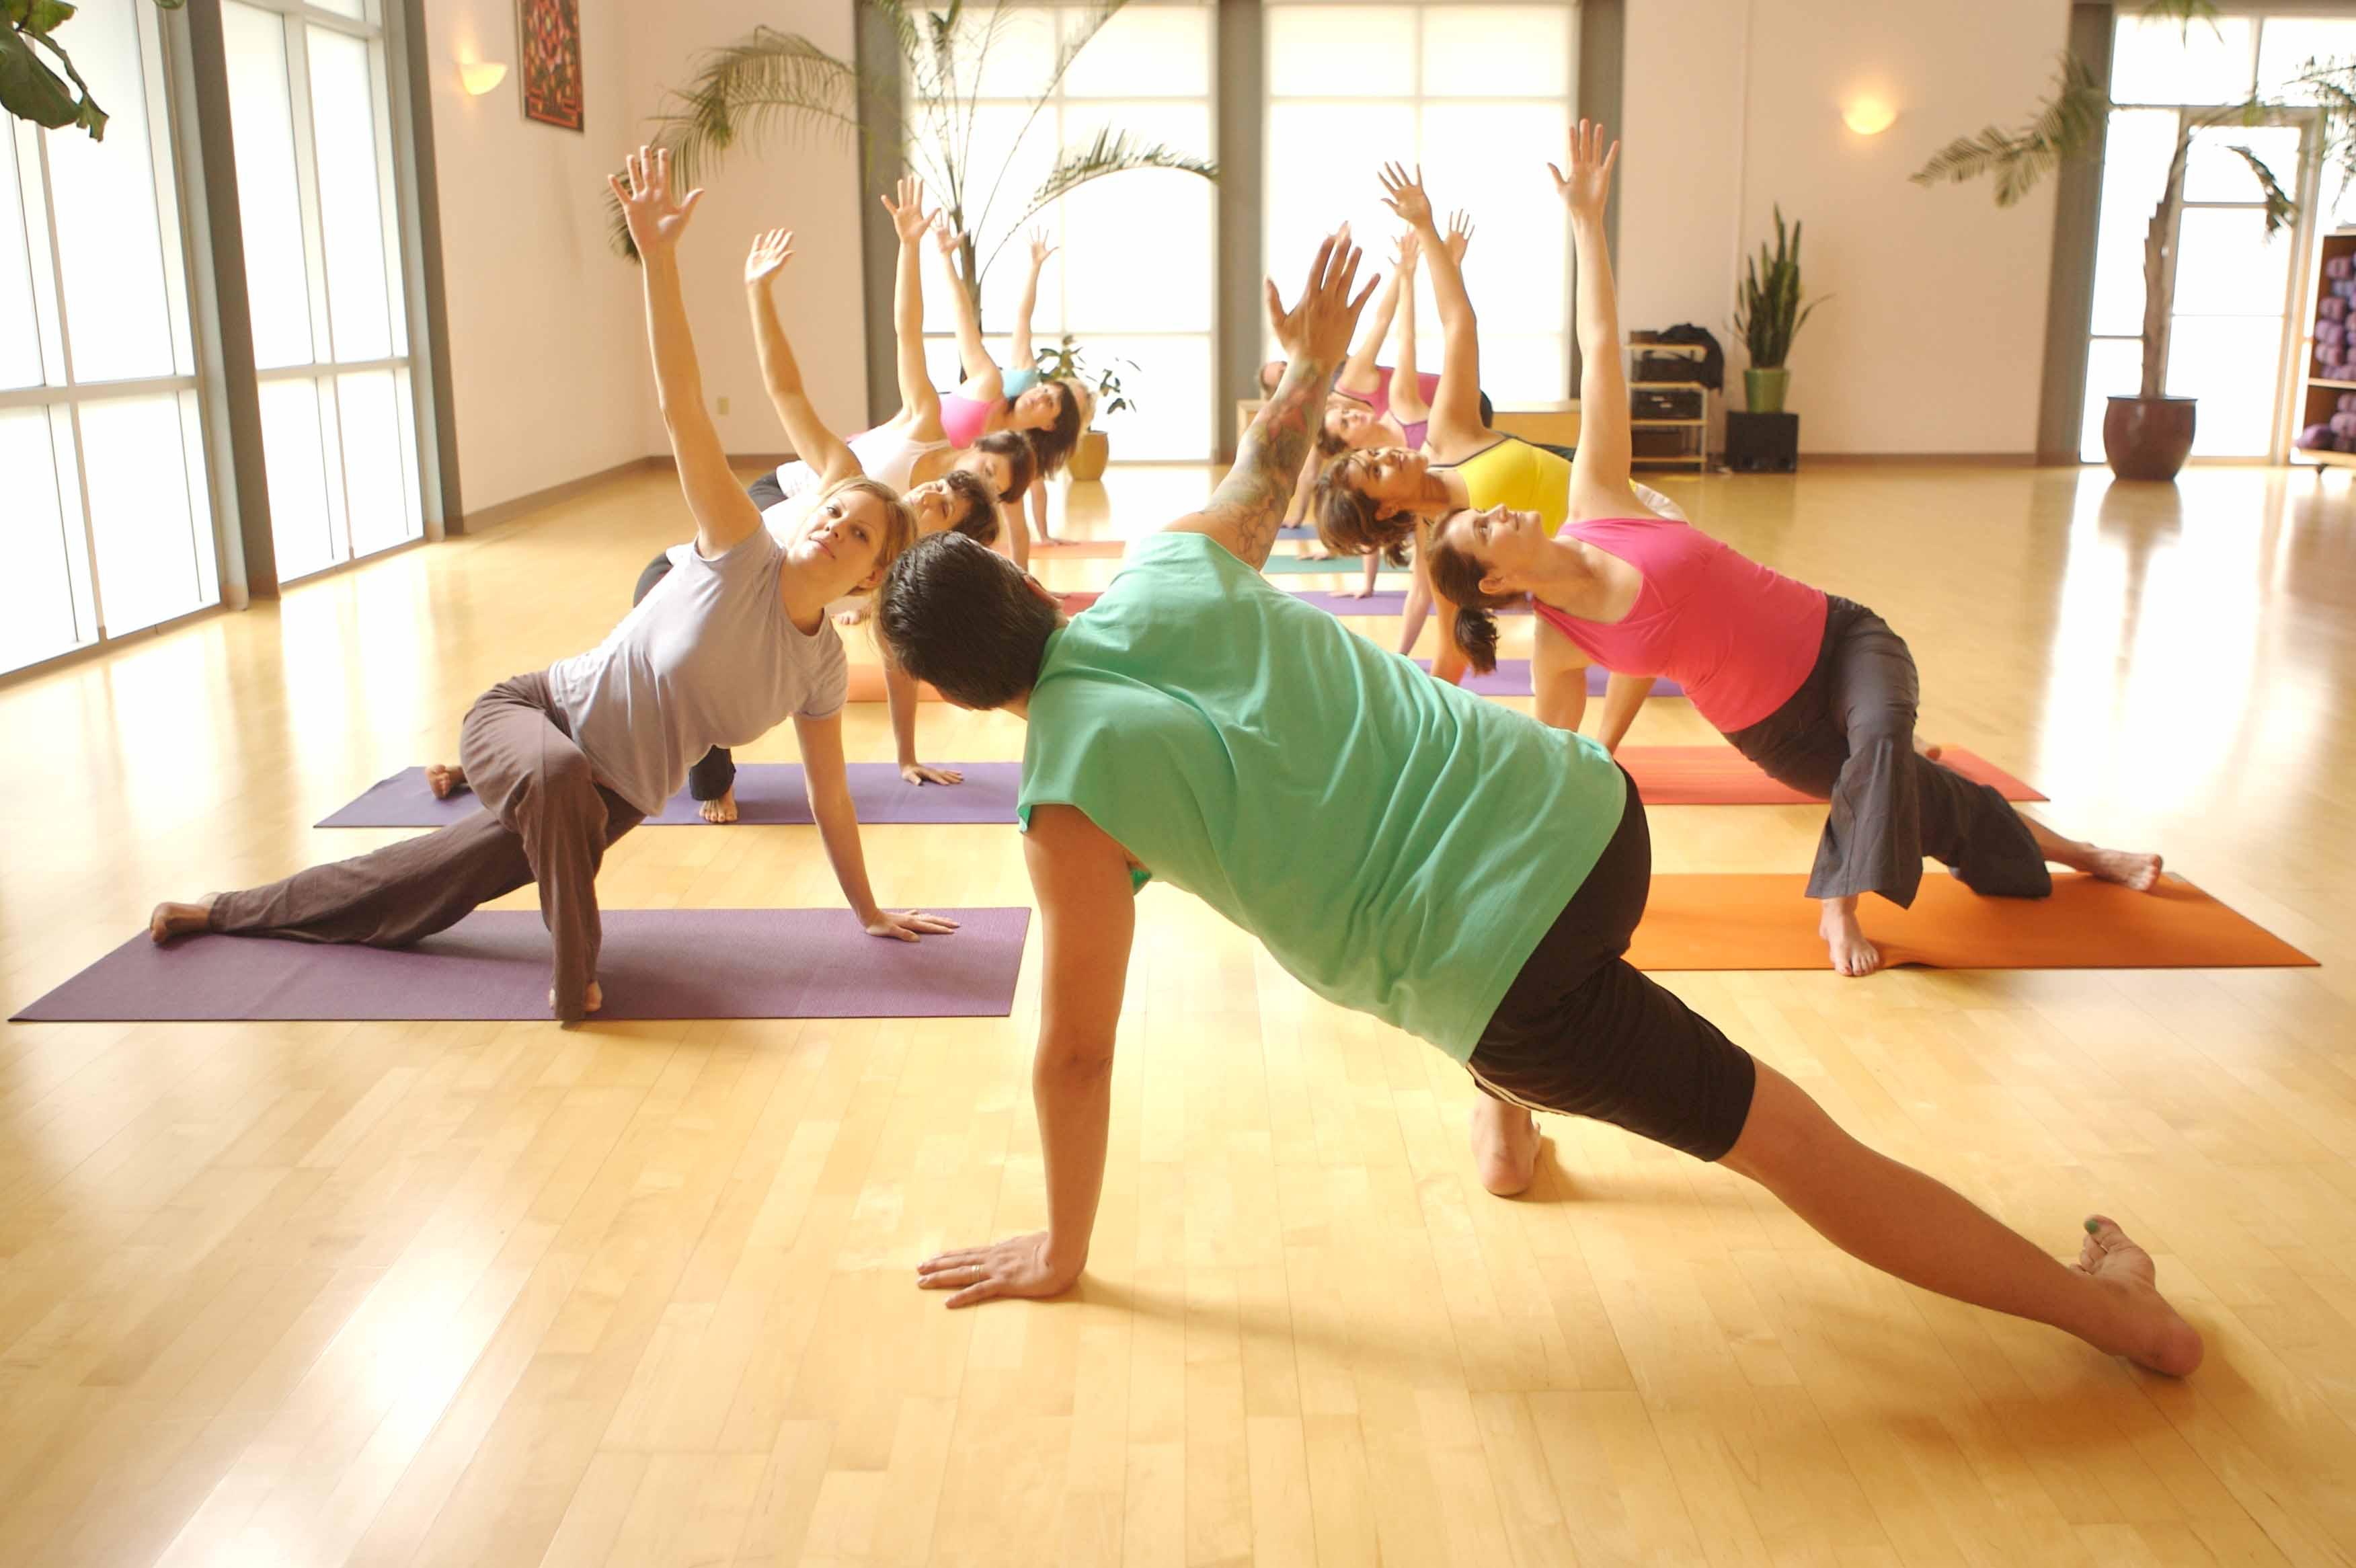 Peaceful workouts at Yoga Yoga